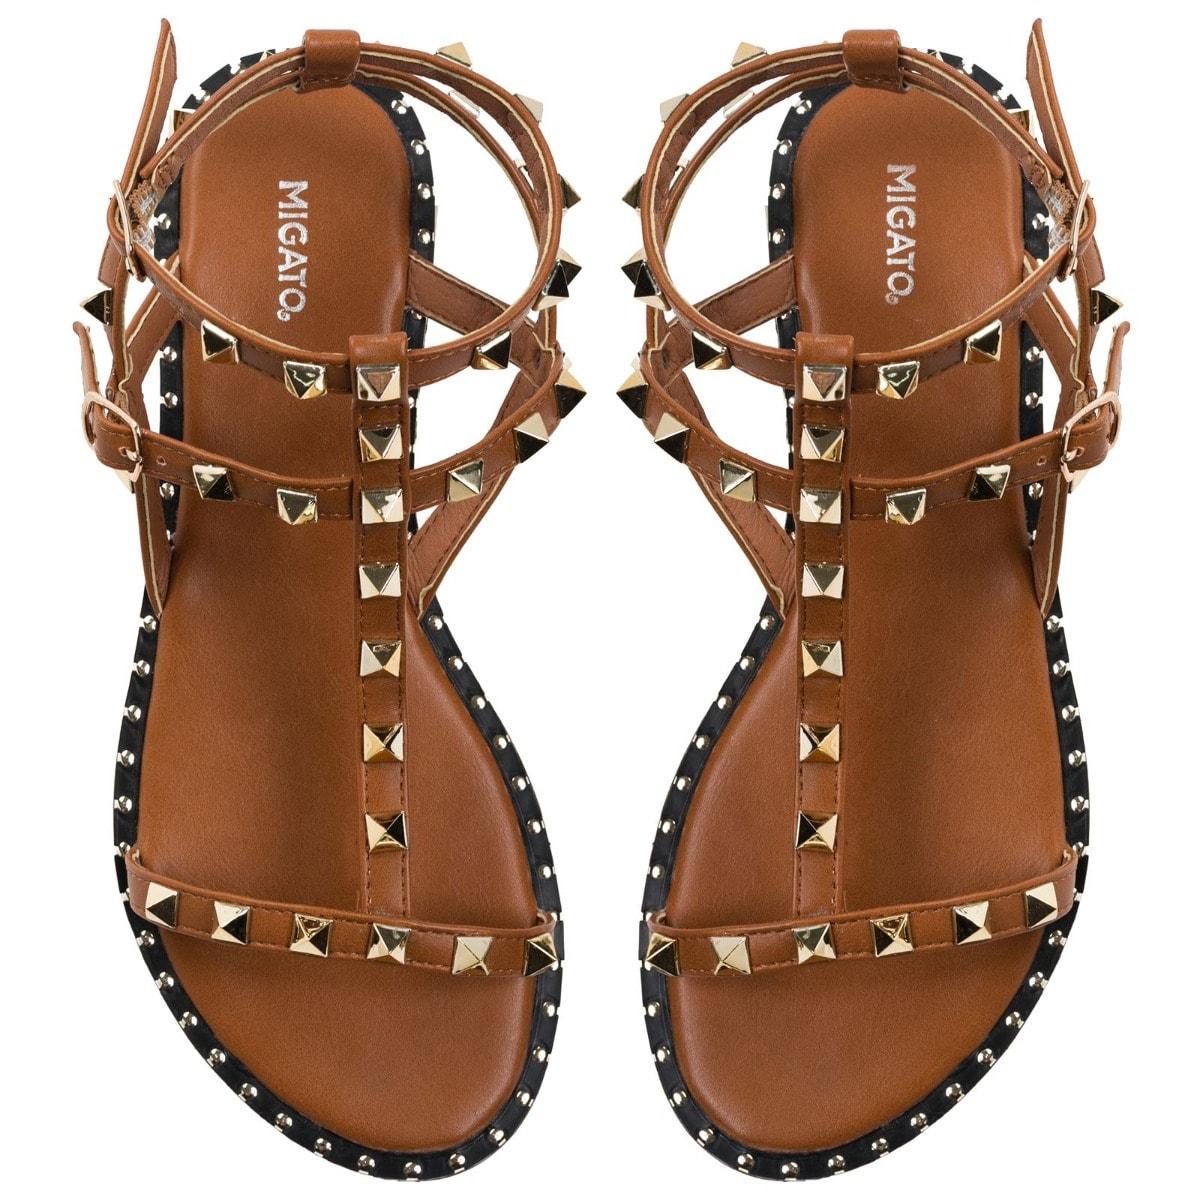 MIGATO SH8201-L52 camel multistrap sandal with studs